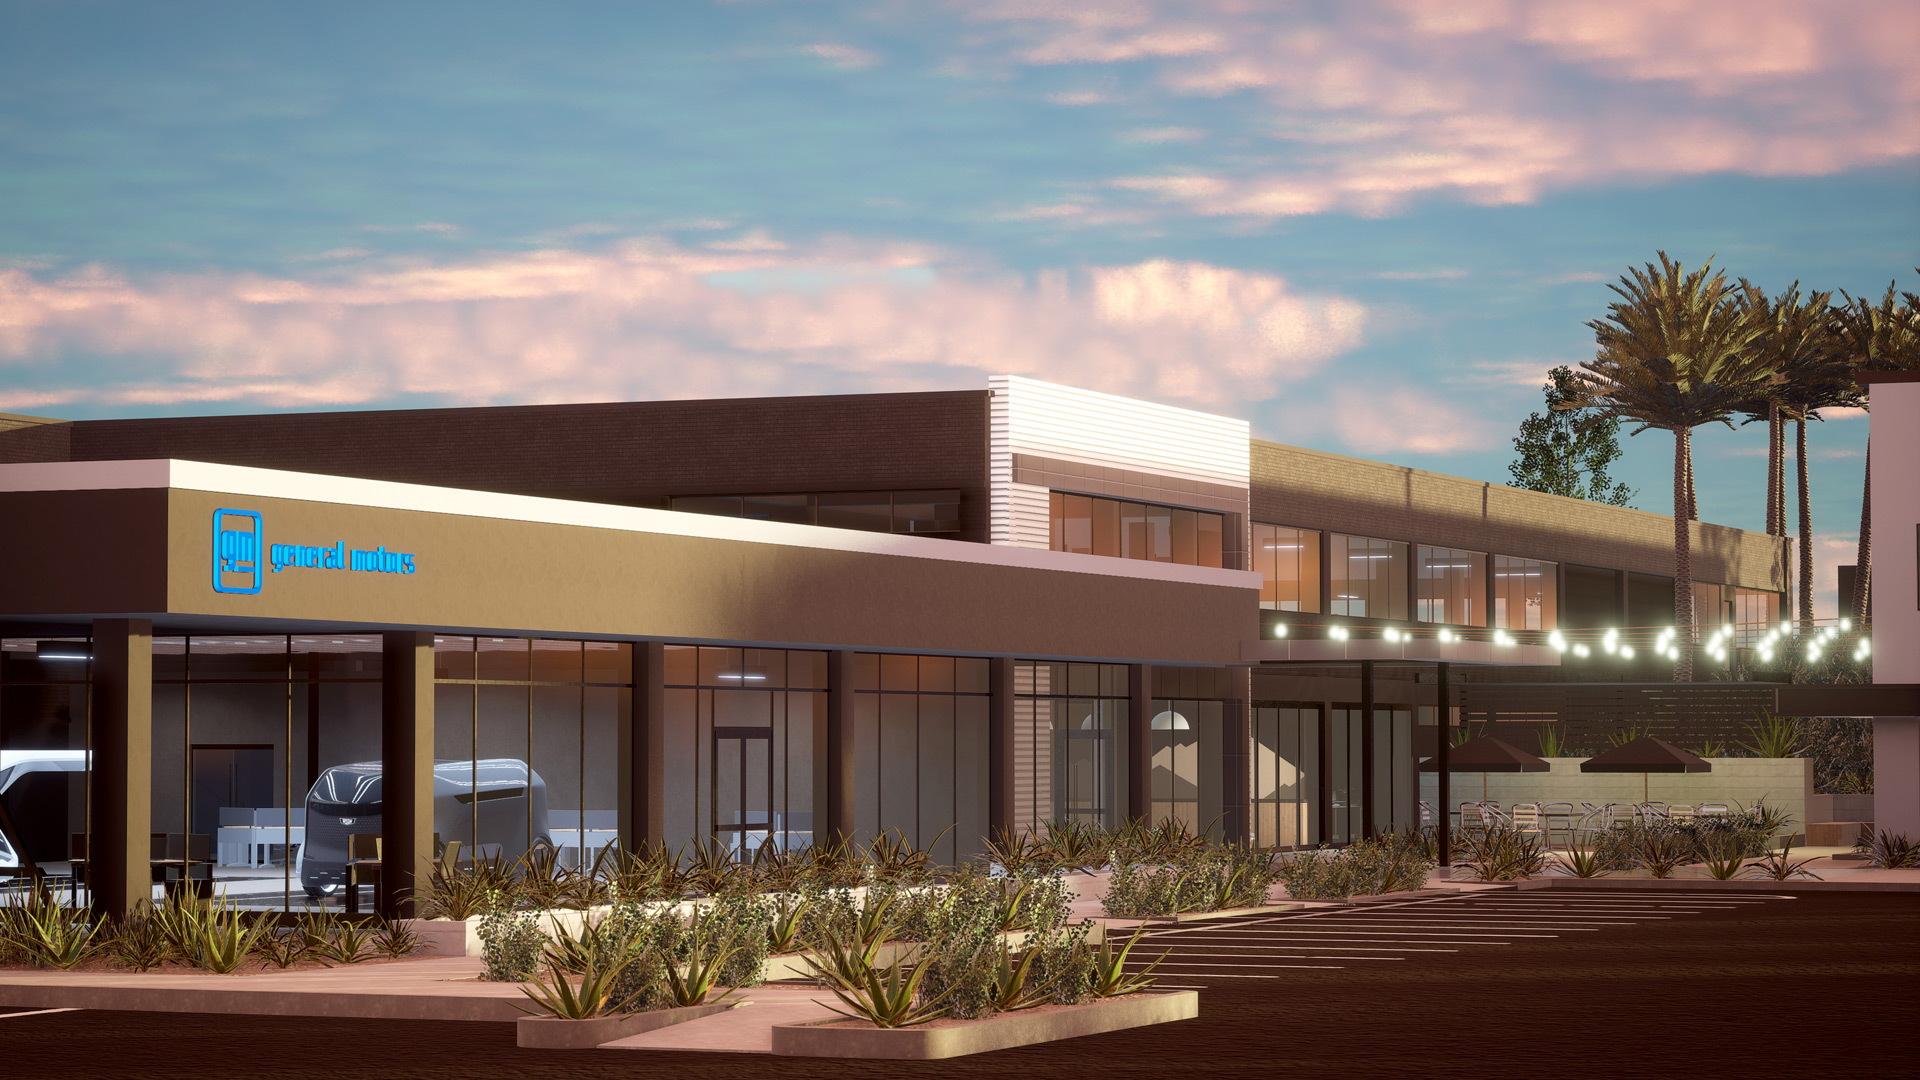 Artist's impression of GM design center to be built in Pasadena, California